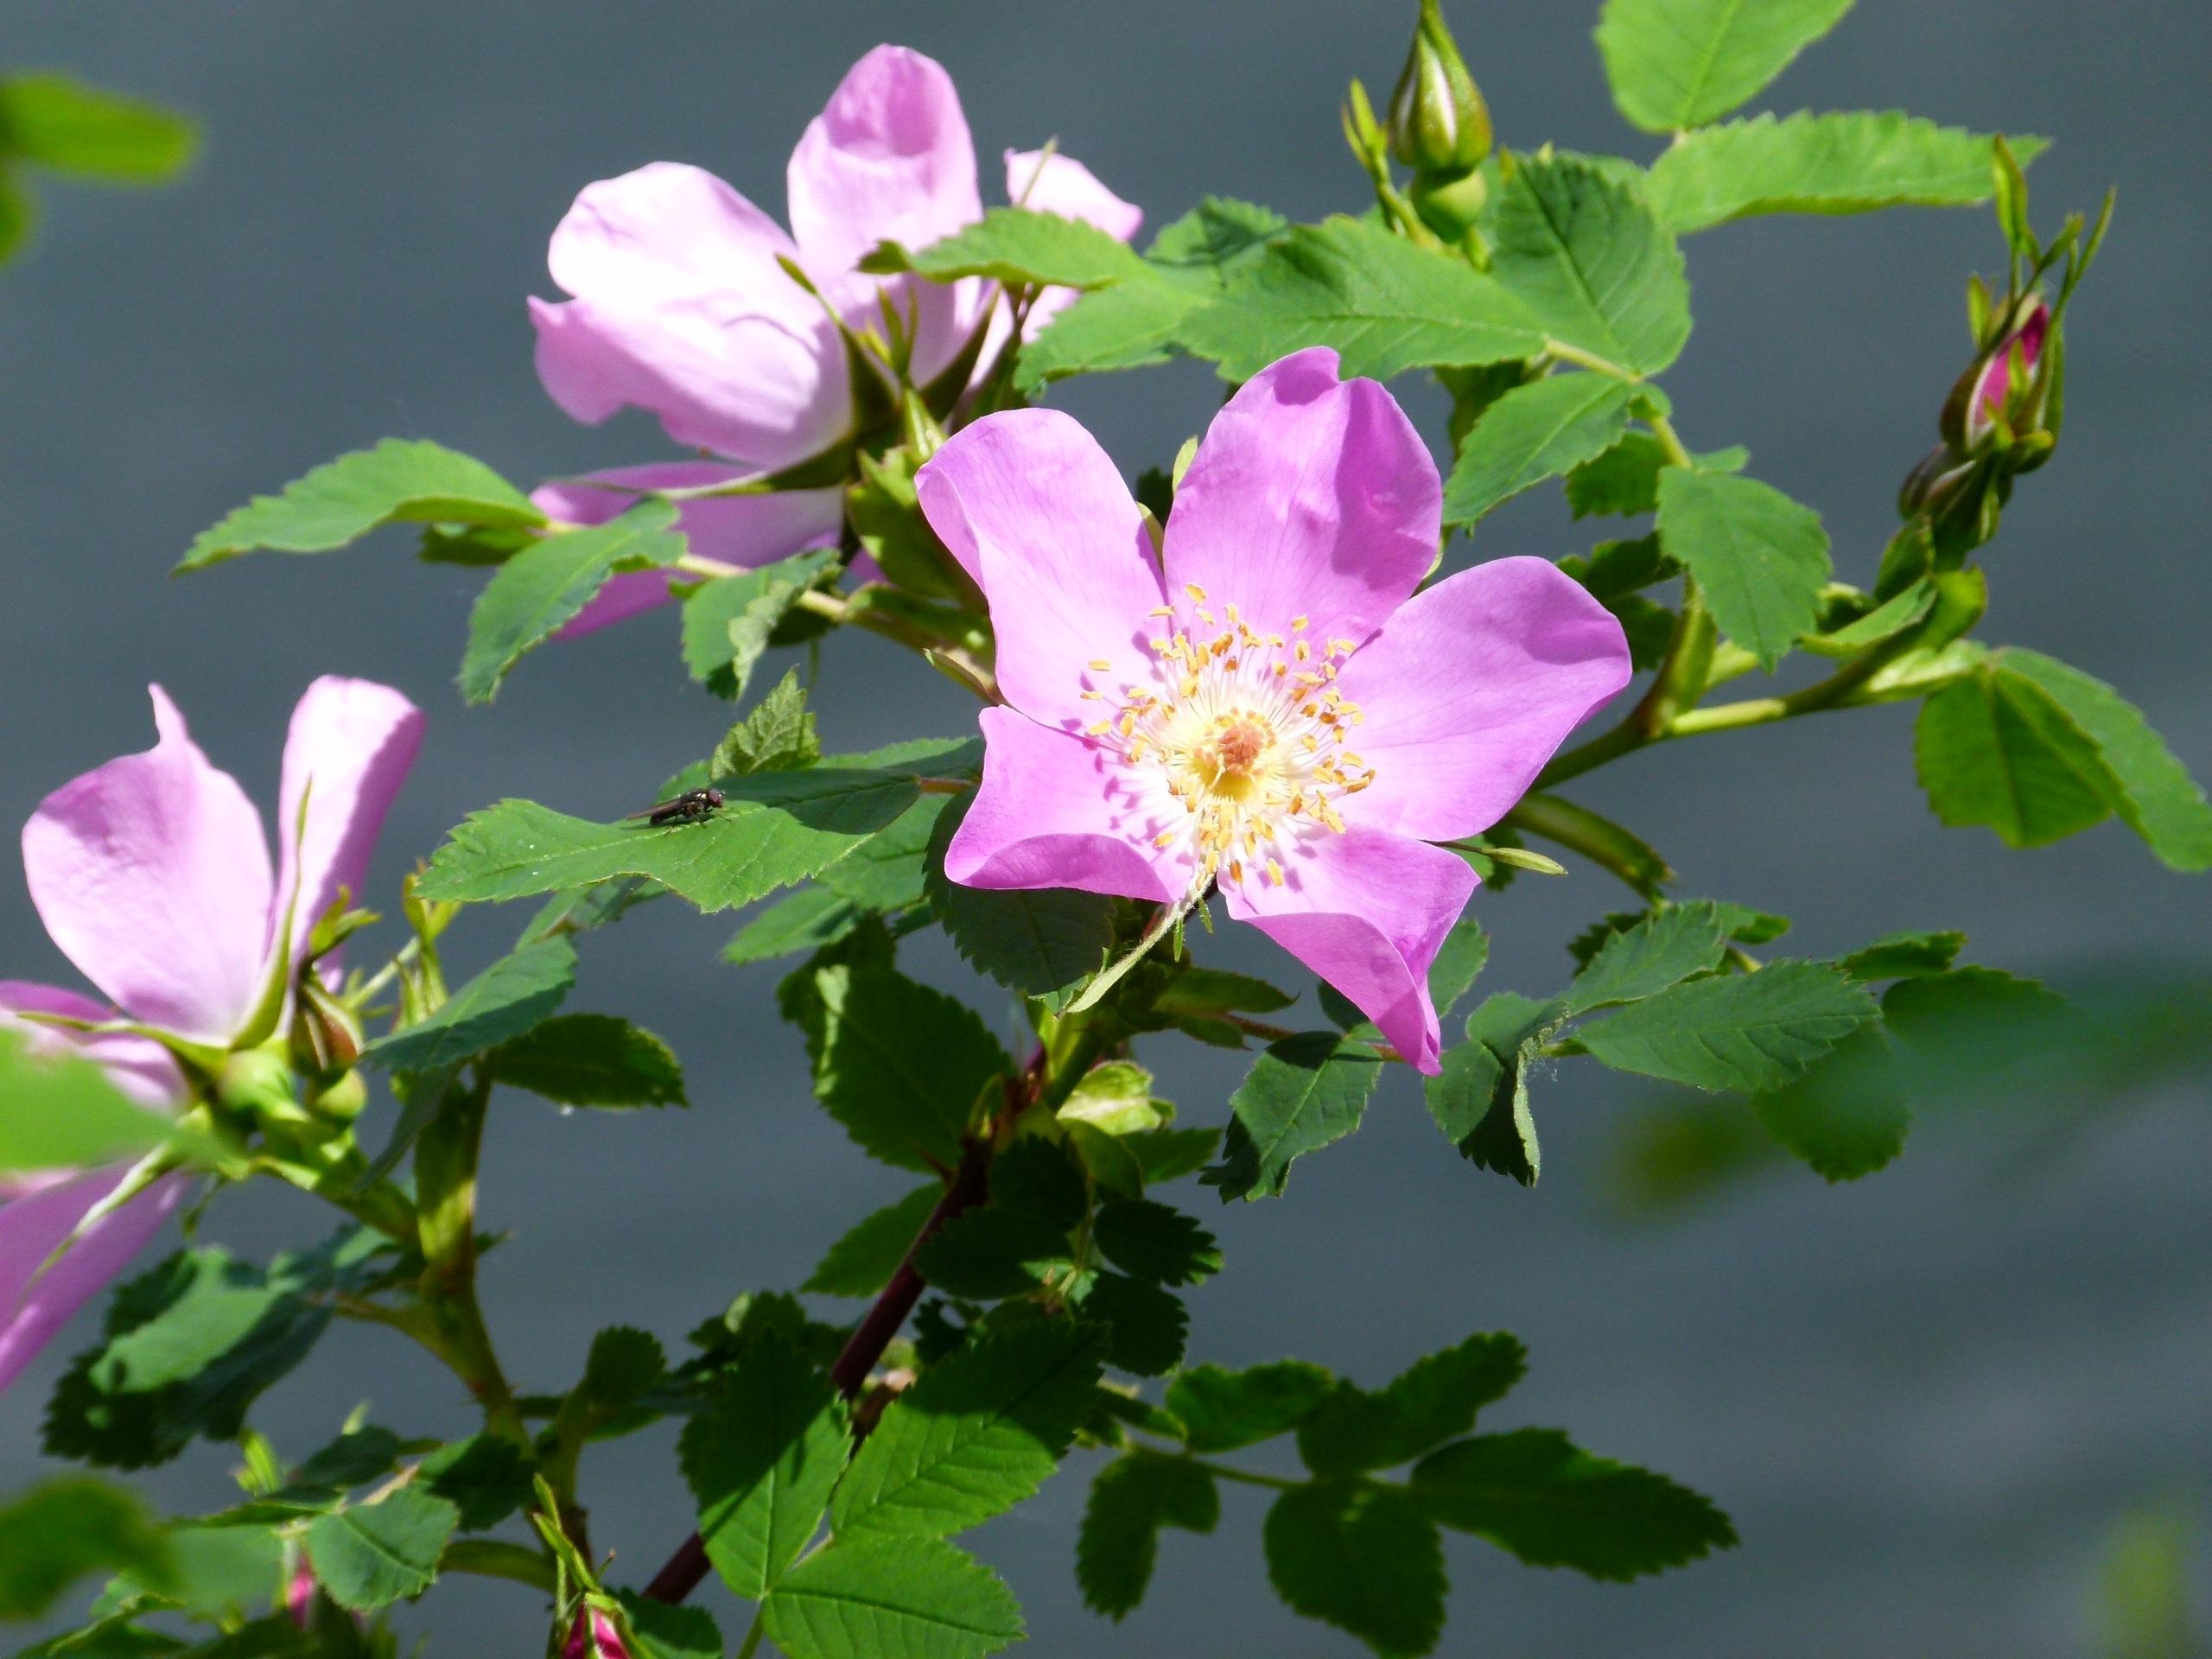 banco de imagens natureza ramo flor plantar folha flor ptala floral selvagem botnica flora flores silvestres arbusto rosa canina